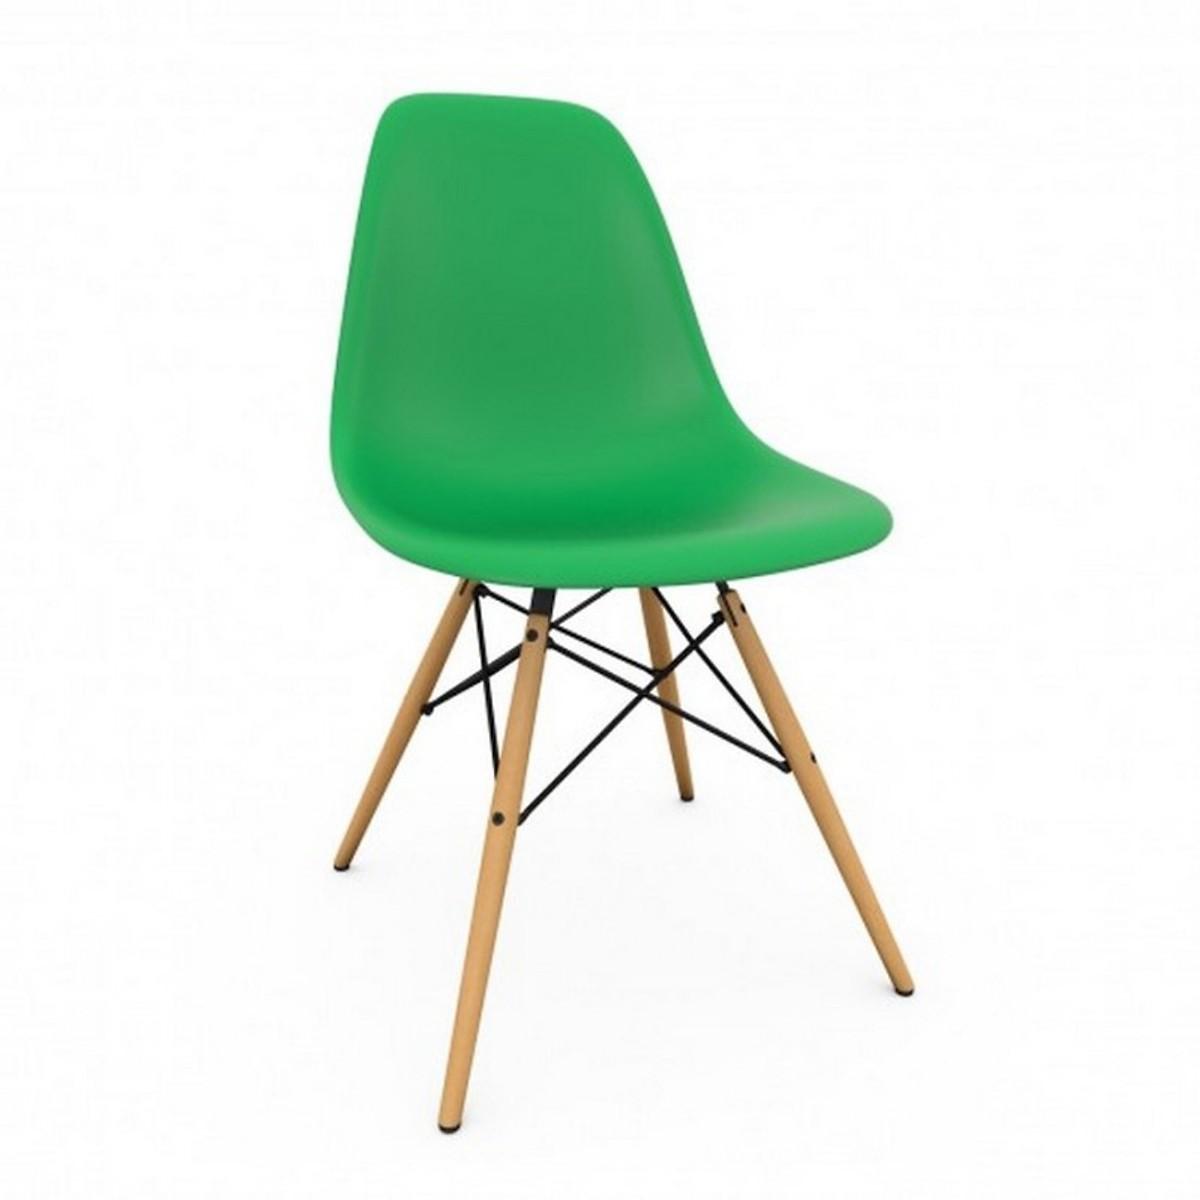 Ghế nhựa chân gỗ E3